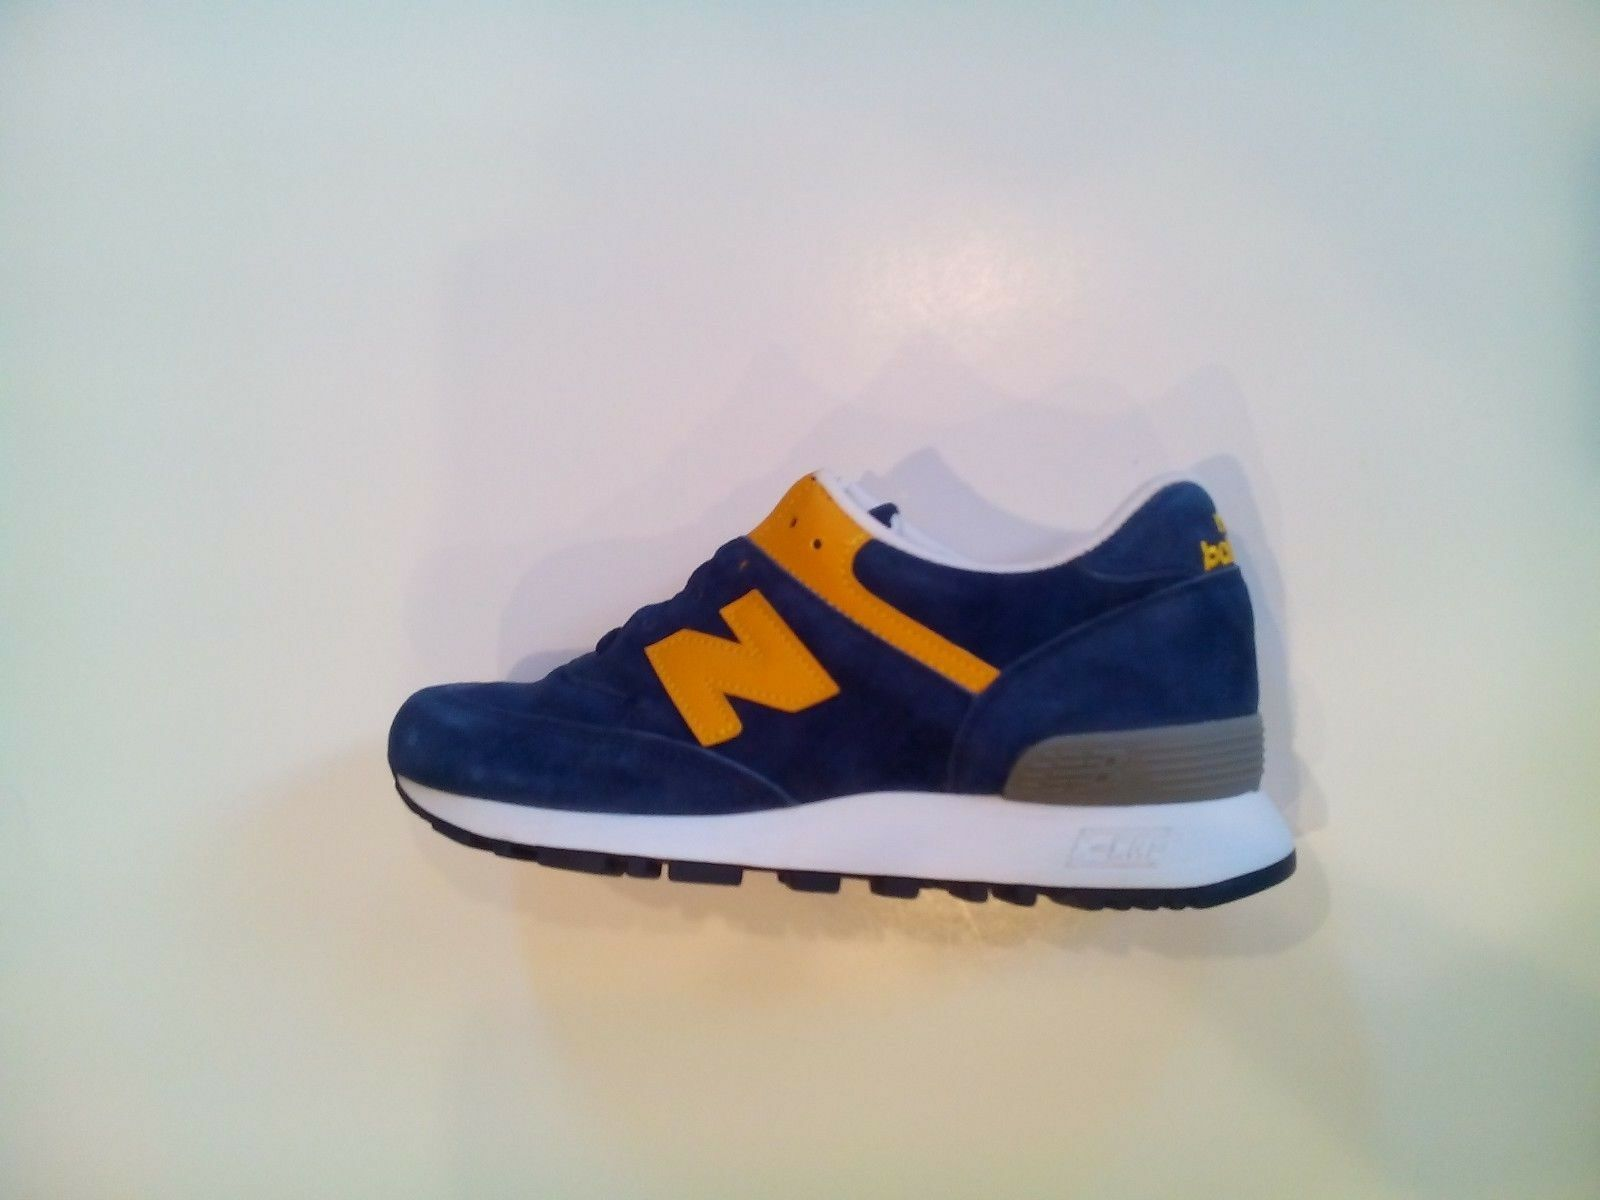 New Balance Wmns 576 UK NB women shoes NEW  Blue  W576-PBY SZ-6.5